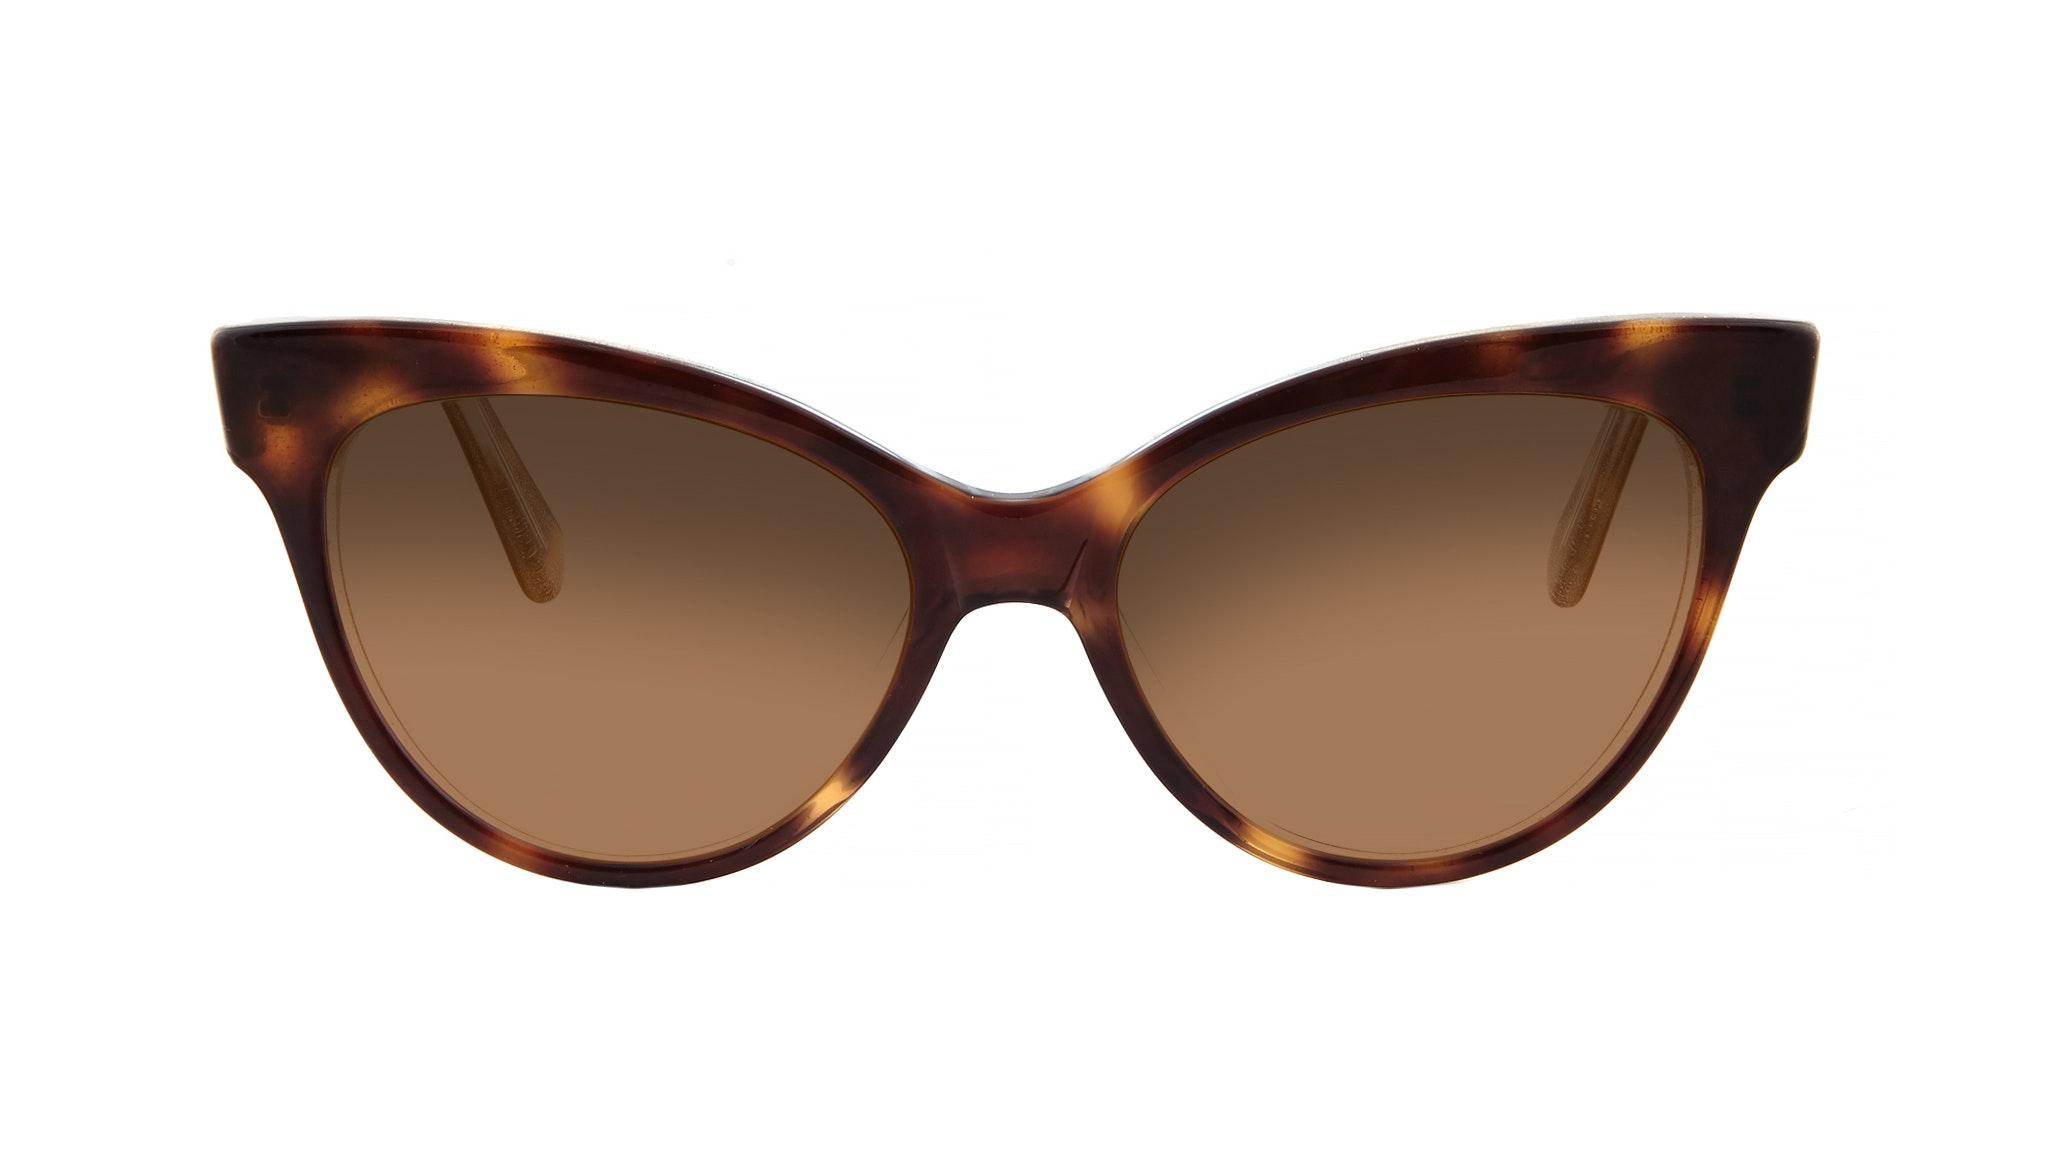 Affordable Fashion Glasses Cat Eye Sunglasses Women SkunkBoy Twinkle Tort